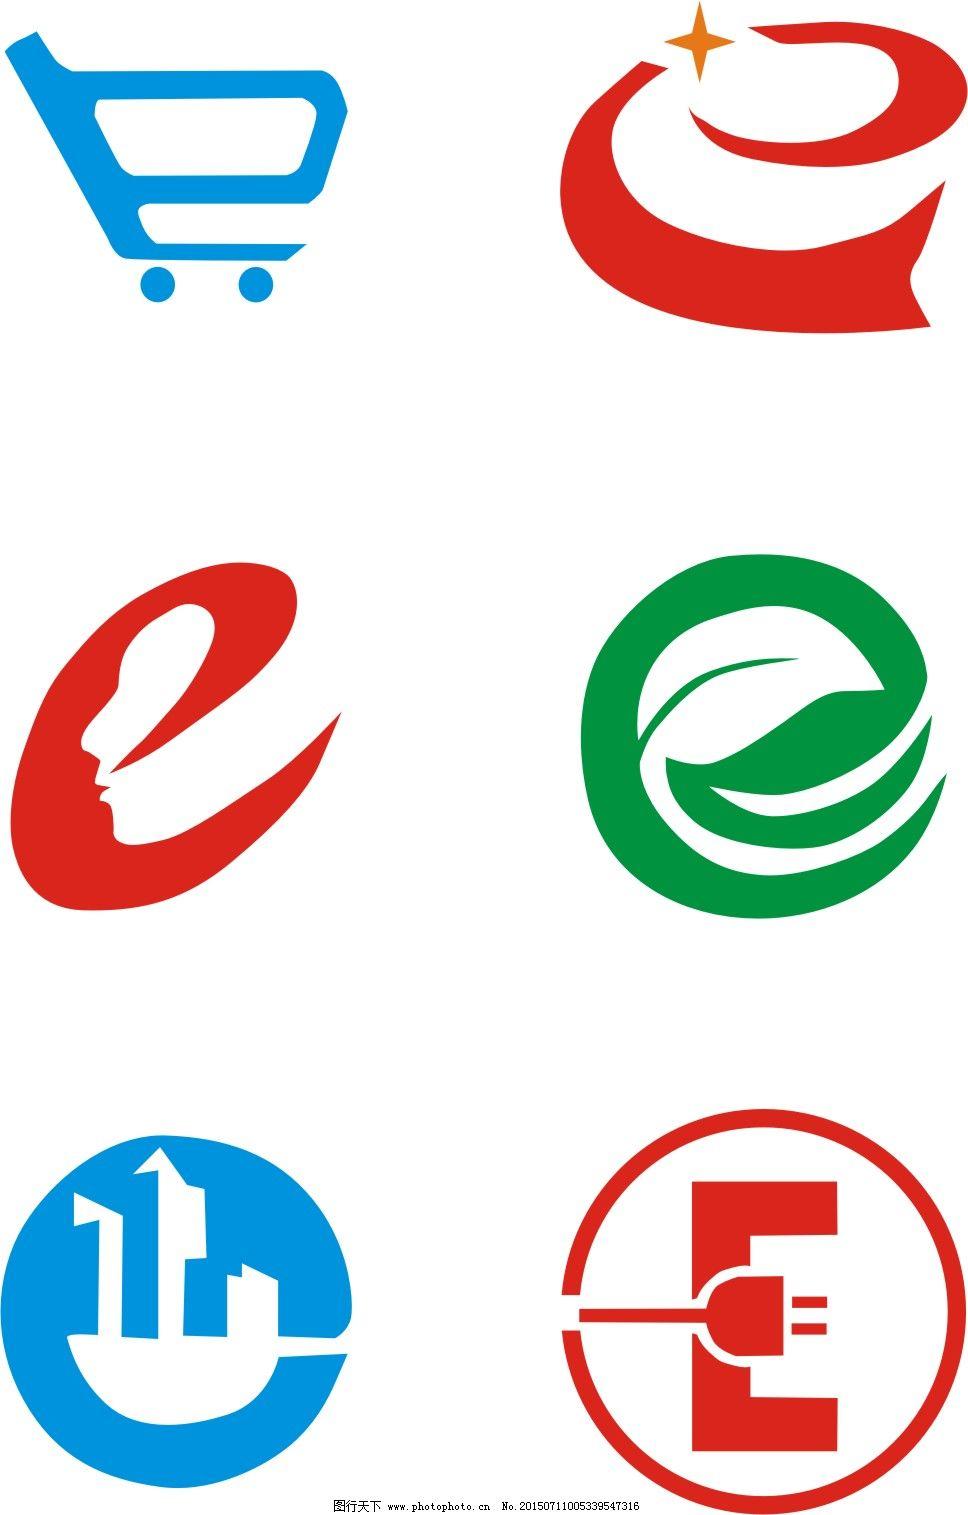 qb 字母logo设计欣赏